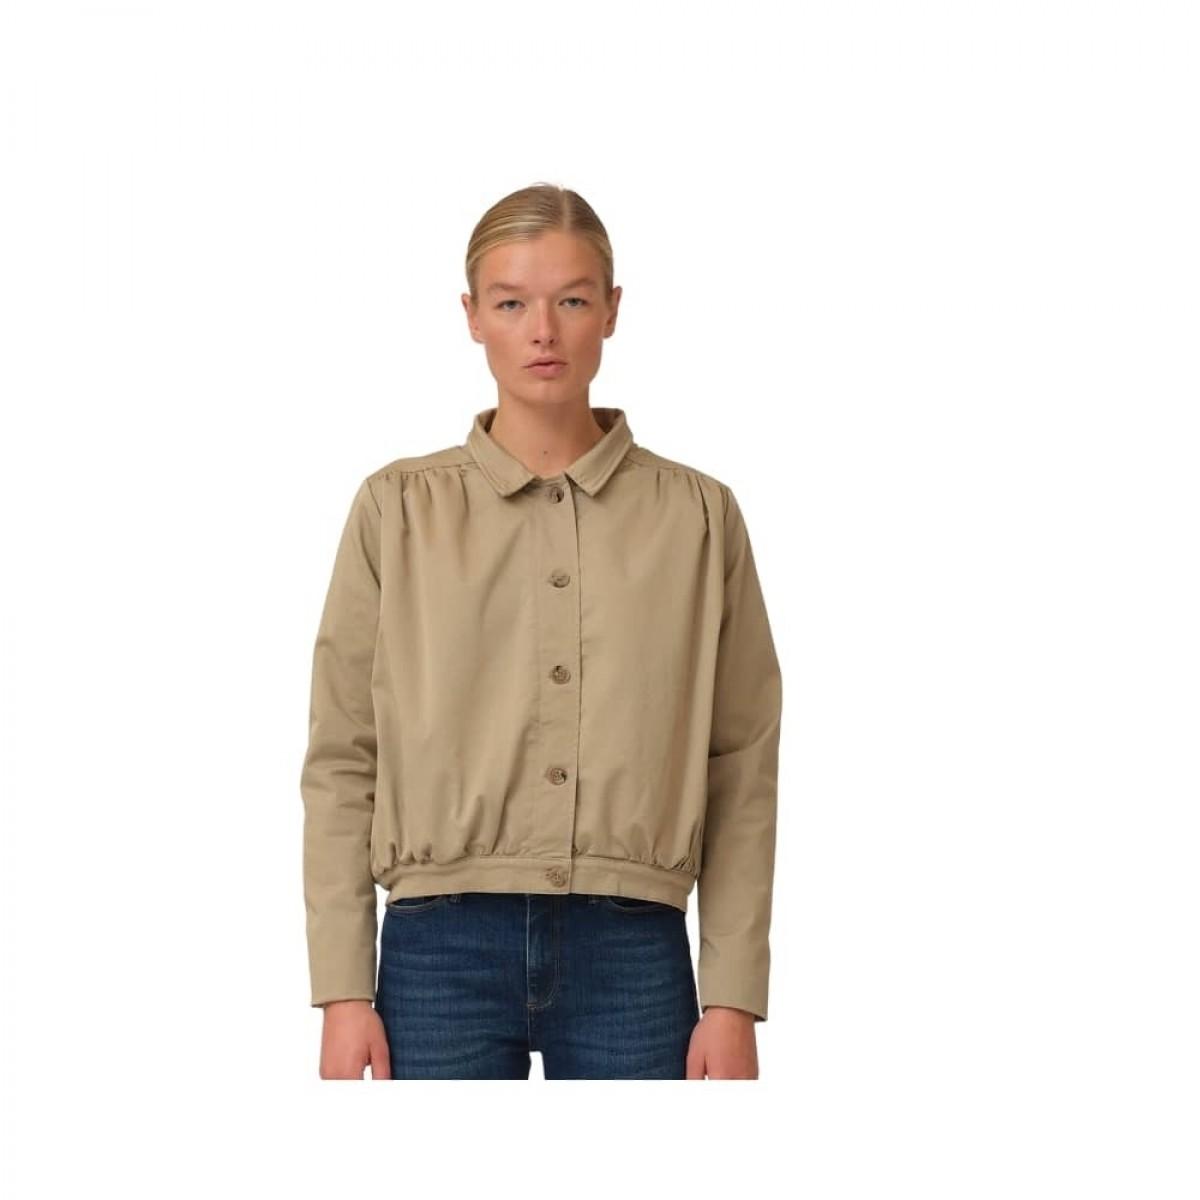 greta cropped jacket - camel